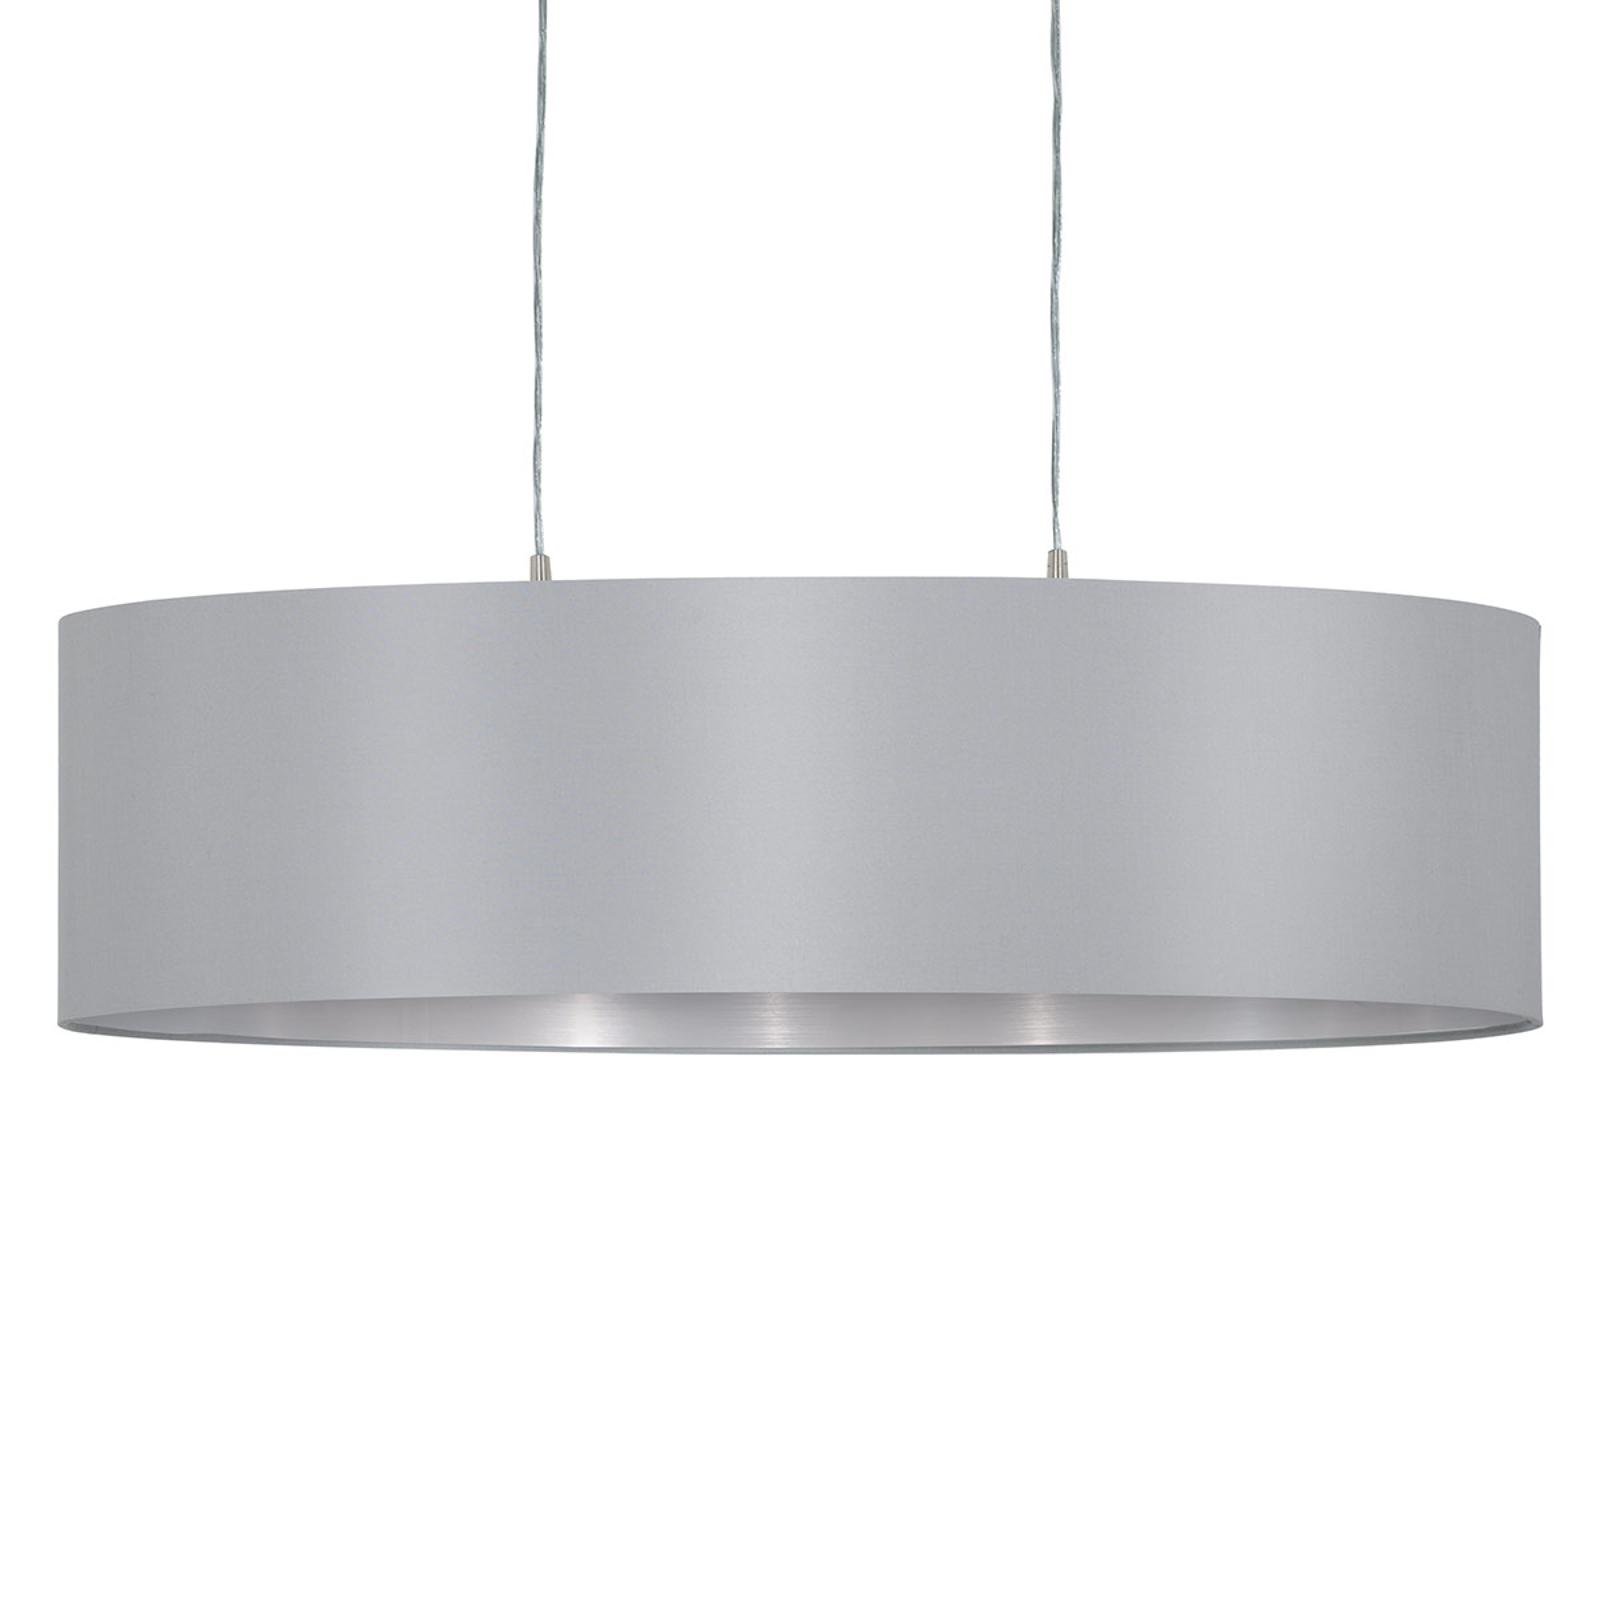 Lampa wisząca Maserlo owalna, szaro-srebrna